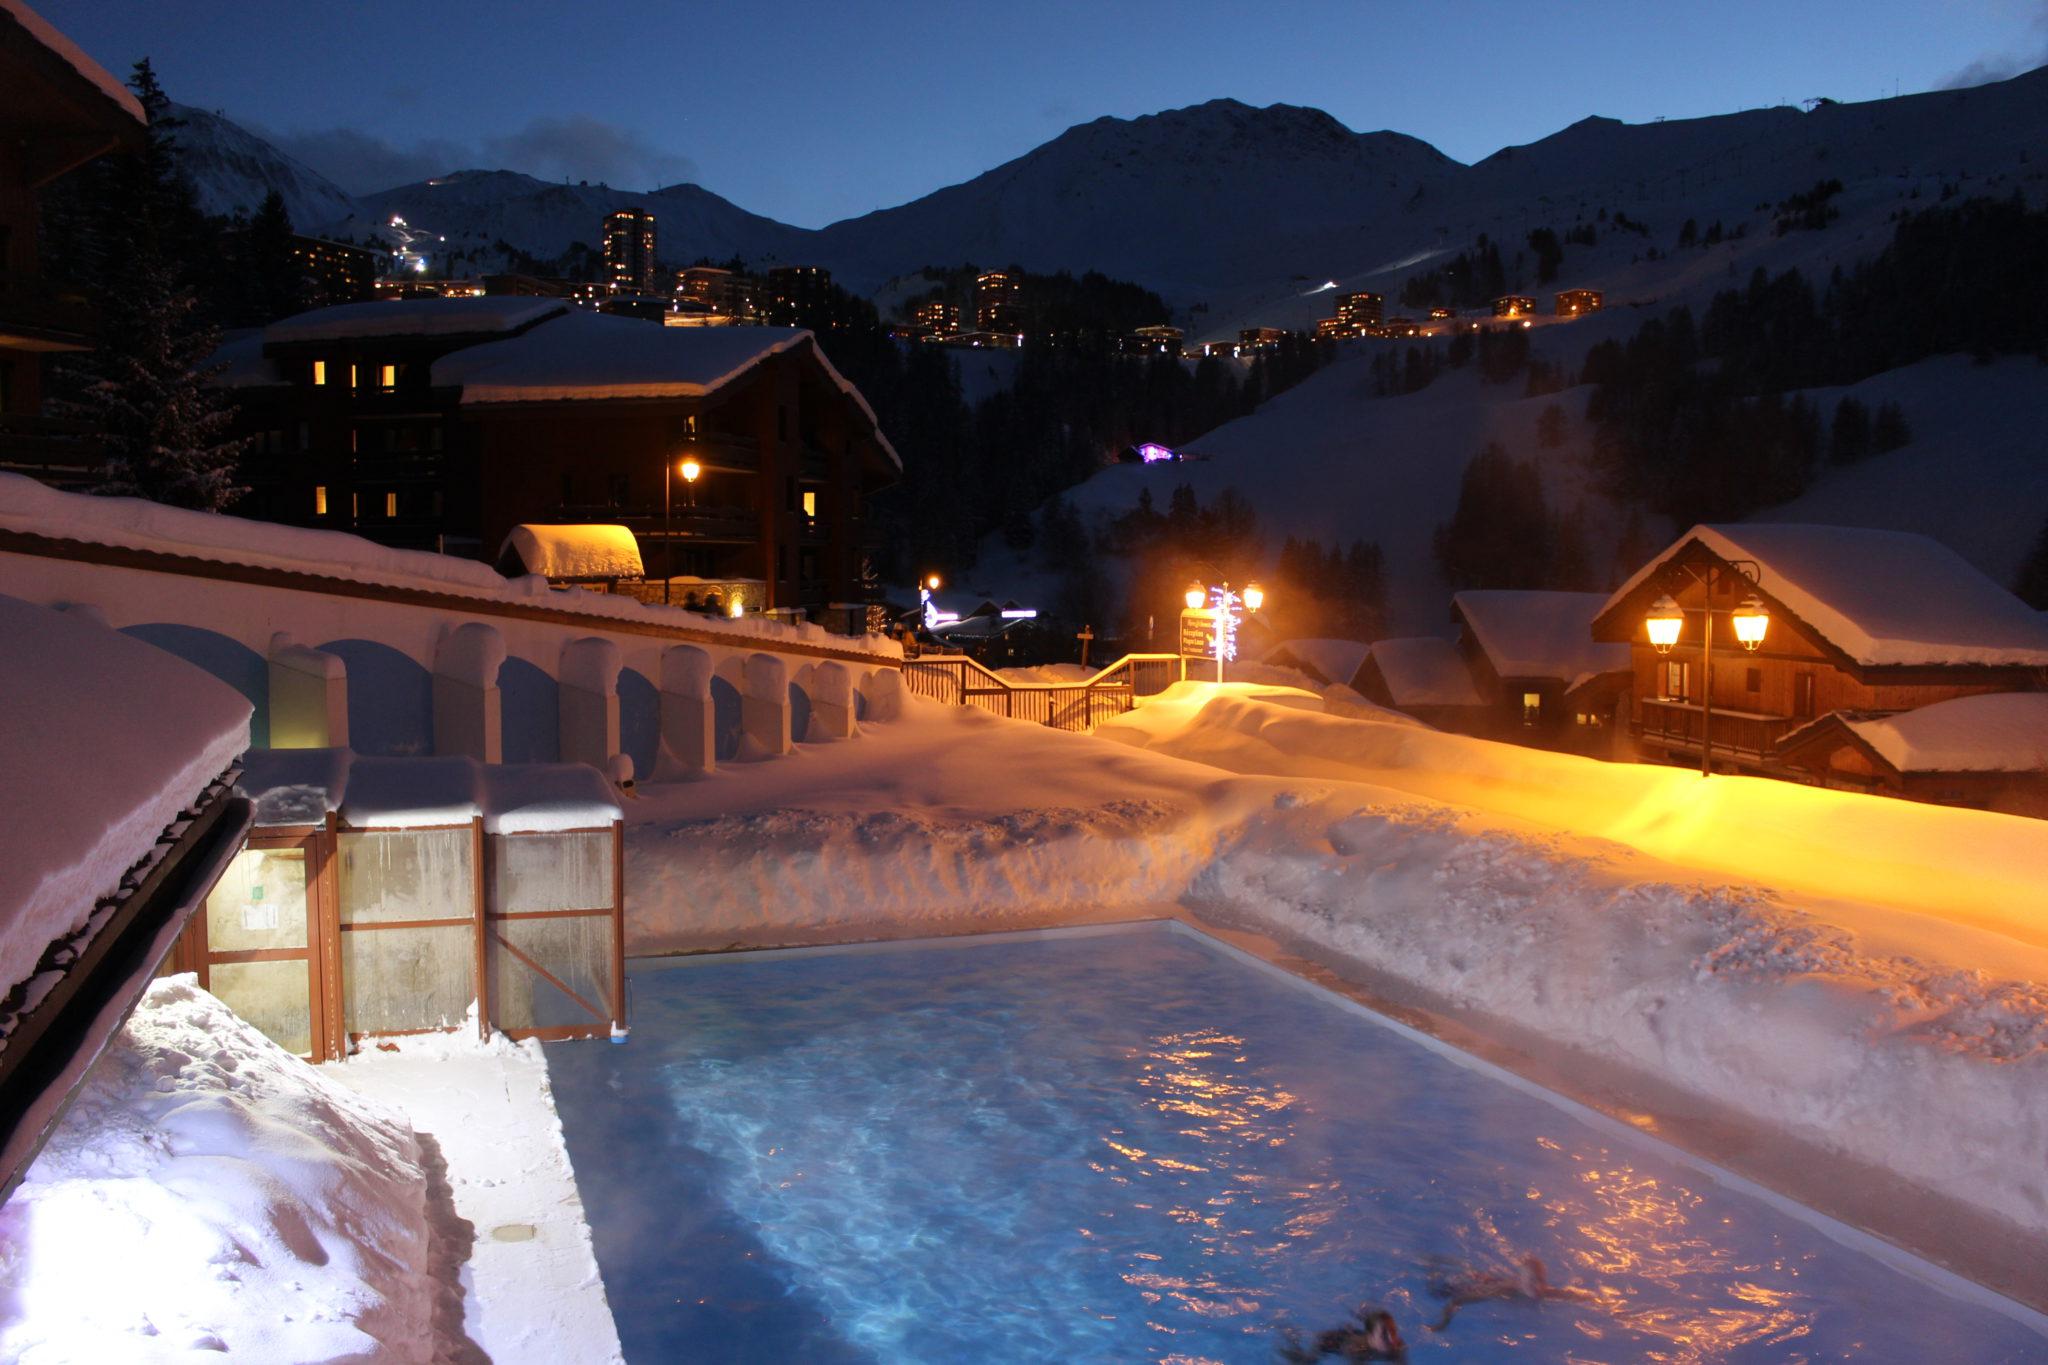 Chalet Petit Chardon: La Plagne ski accommodation in France